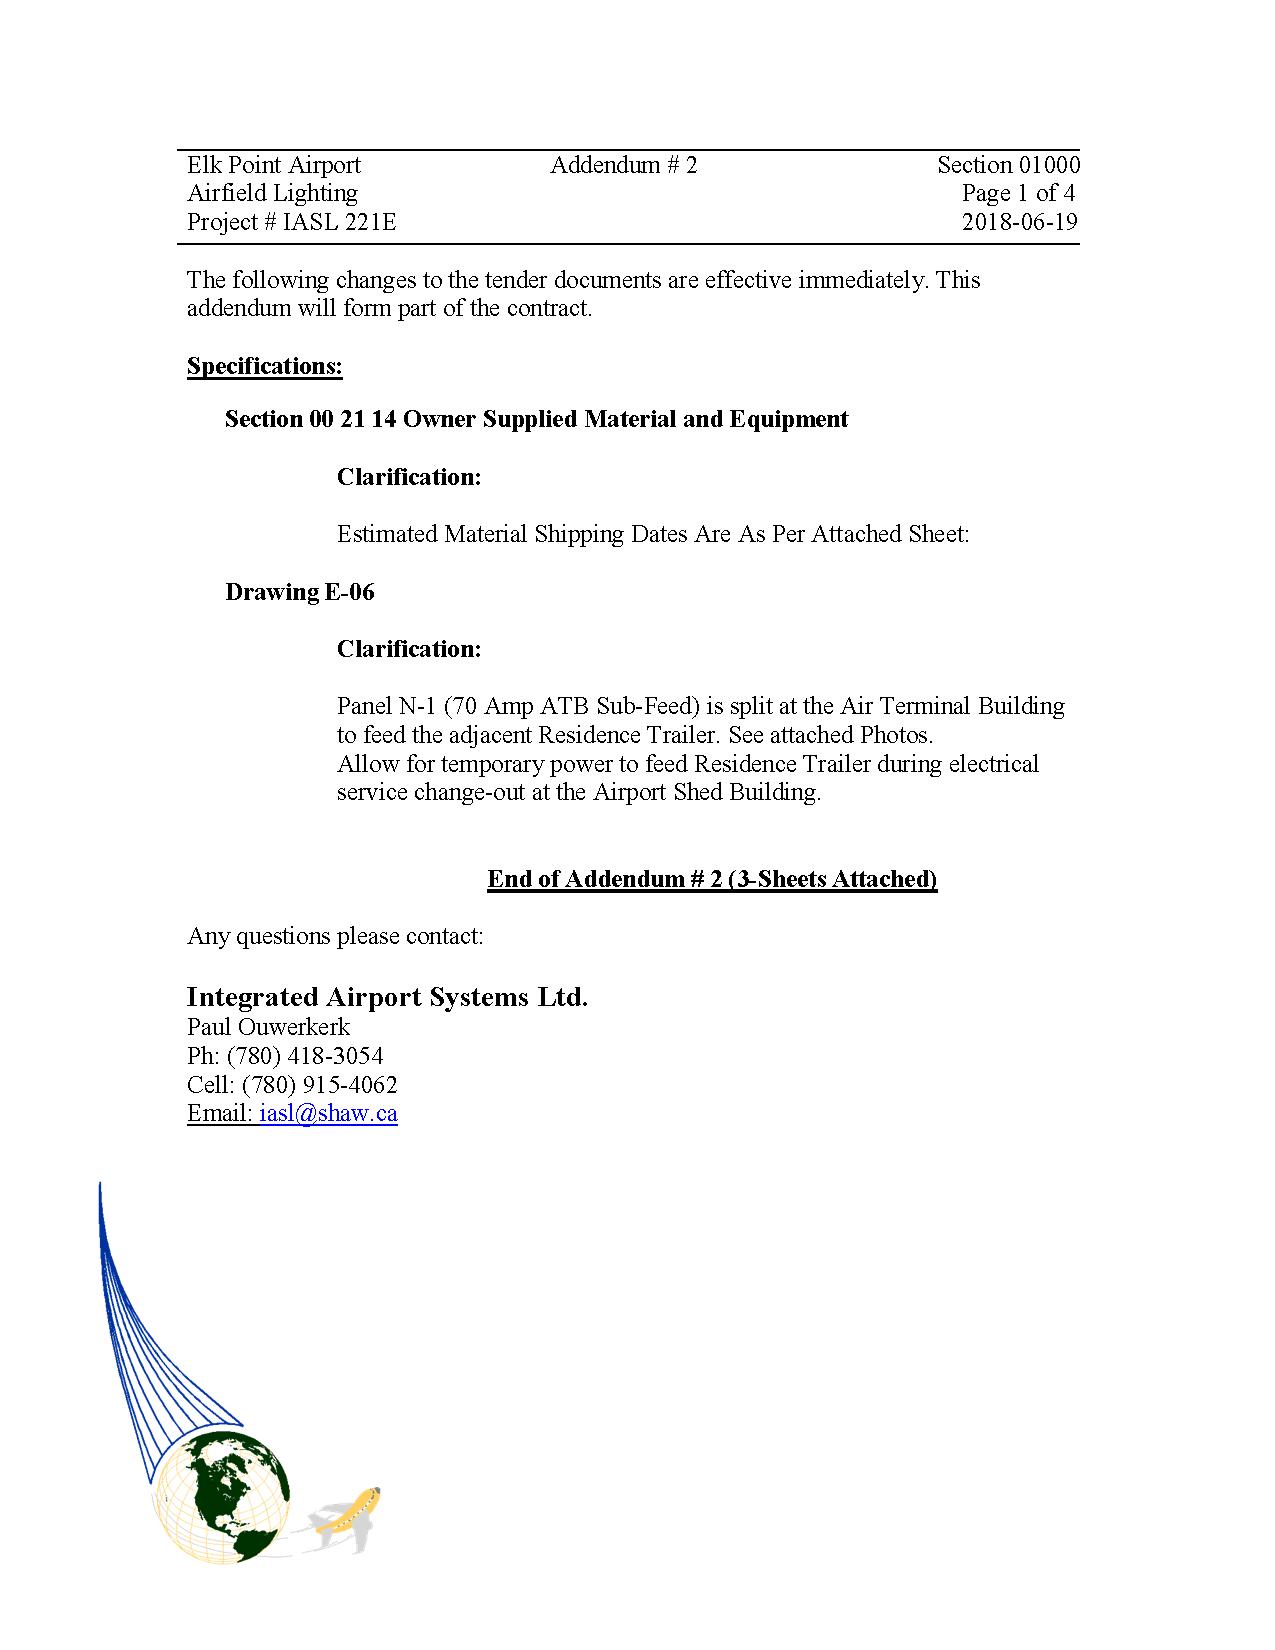 01000 Addendum #2_Page_1